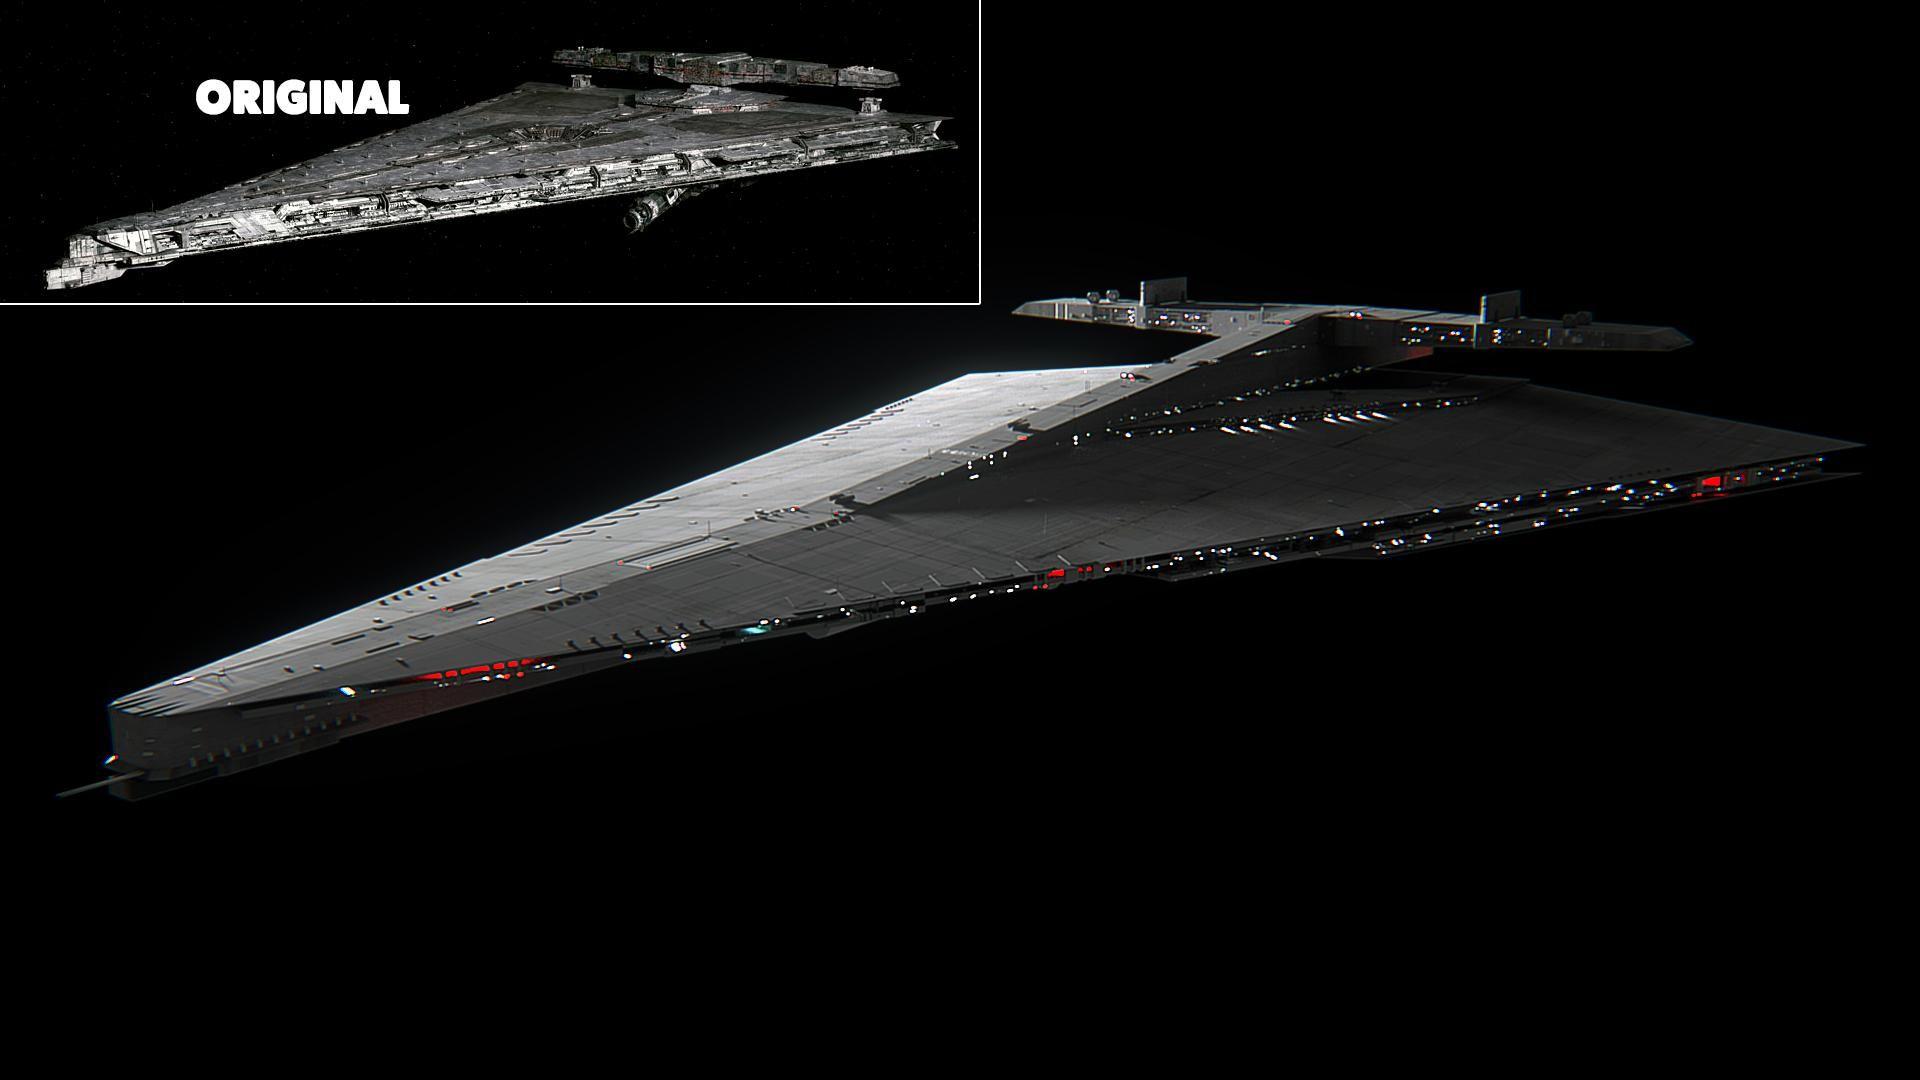 Img In 2020 Star Wars Vehicles Star Wars Spaceships Star Wars Ships